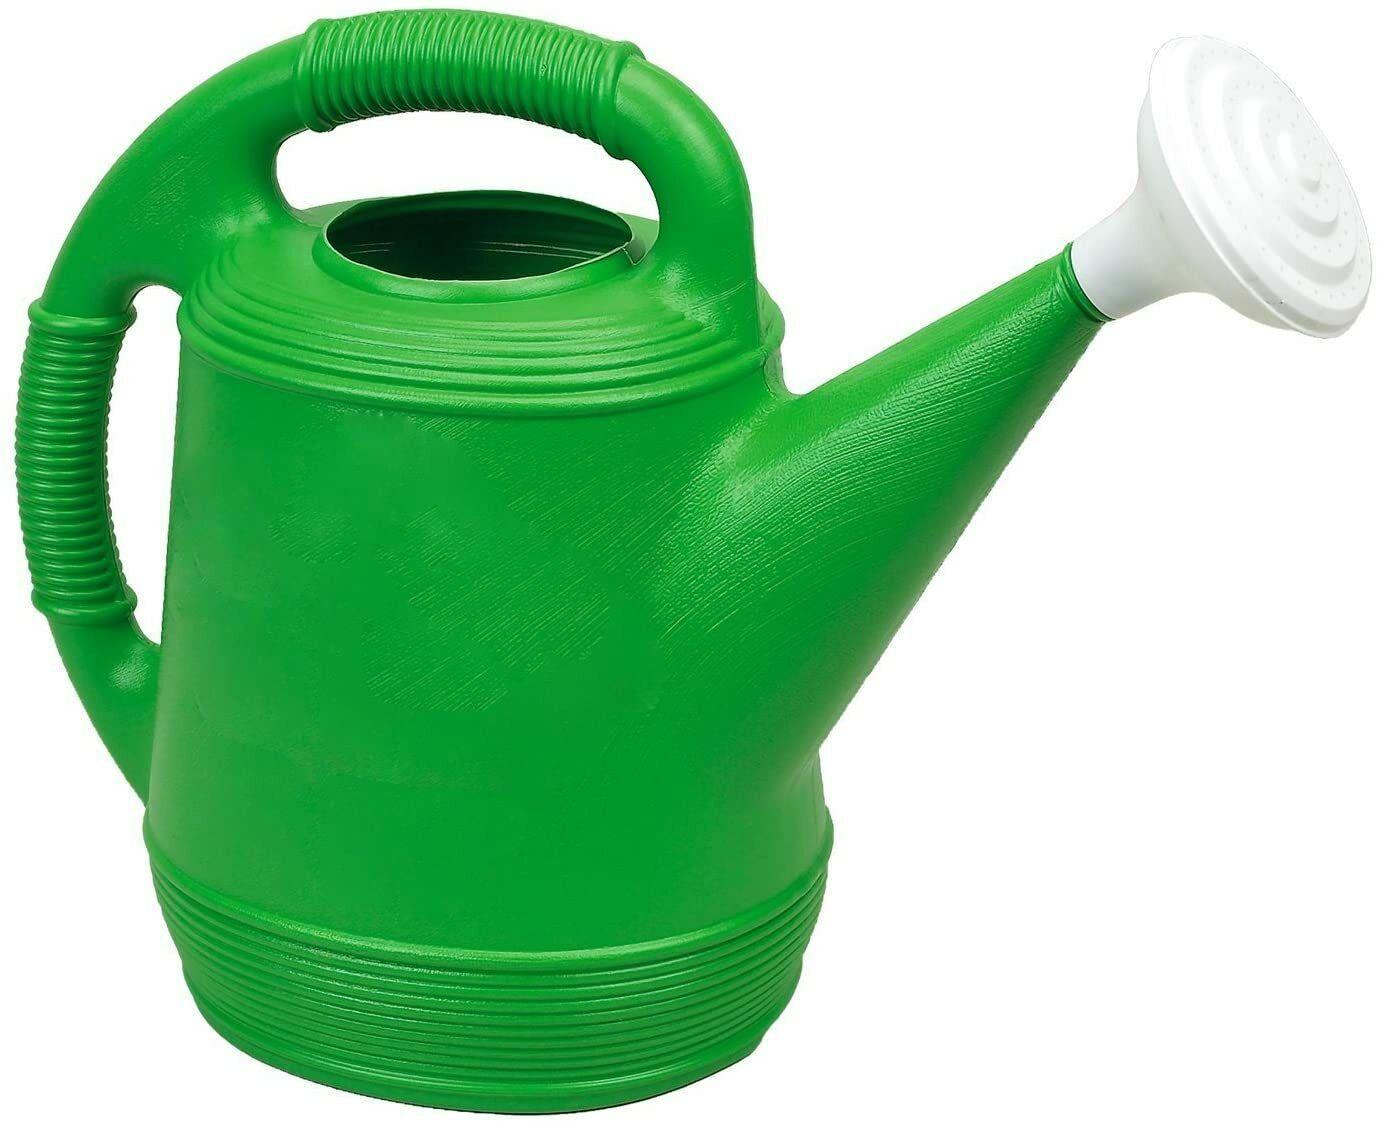 AquaPlumb® 2-Gallon Plastic Watering Can, Lot of 12